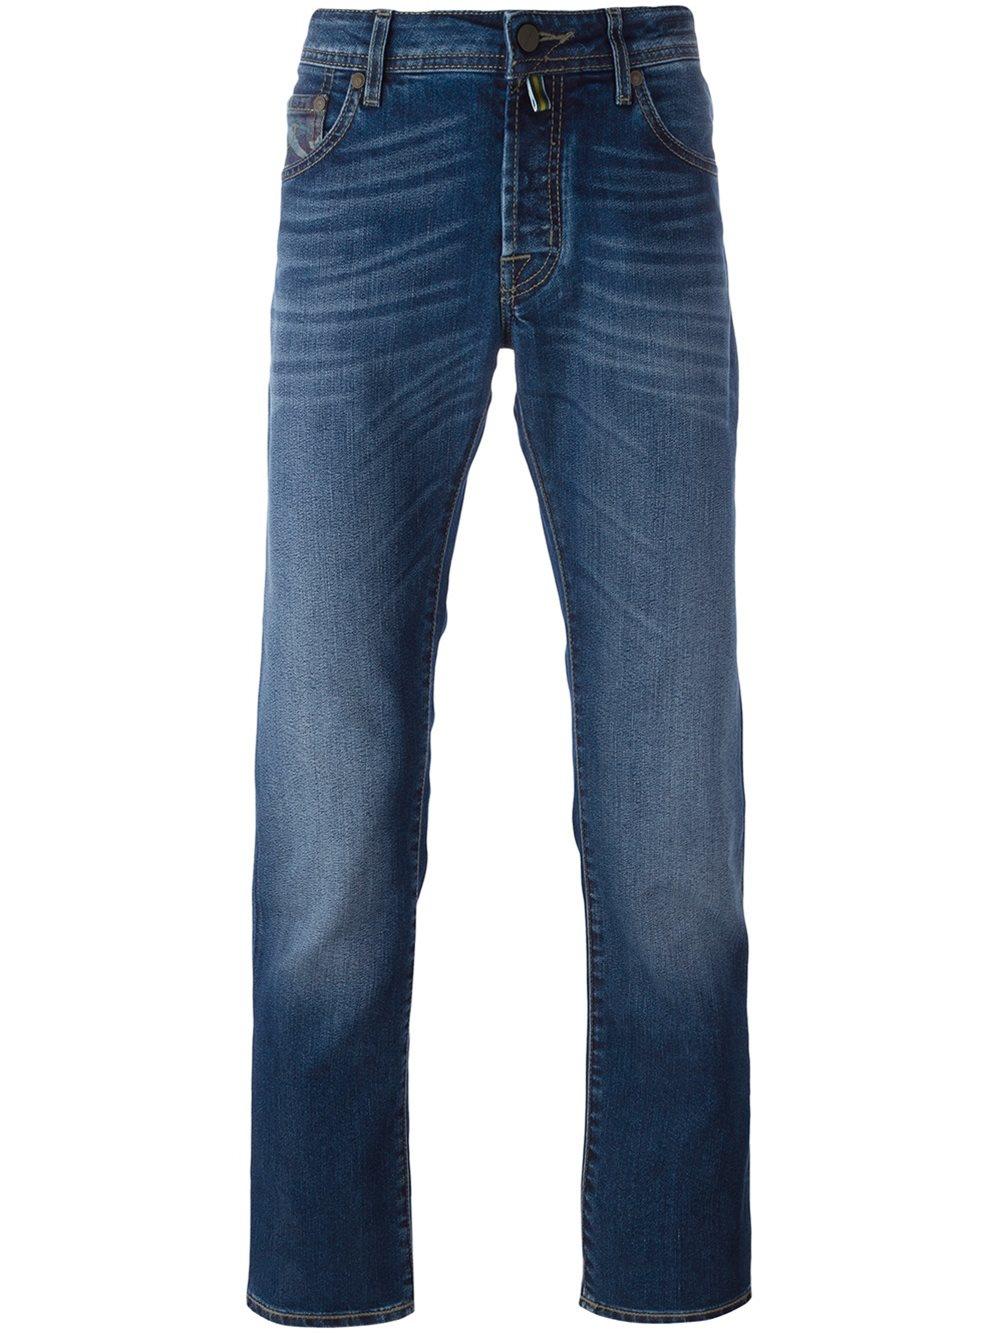 Lyst jacob cohen tapered regular jeans in blue for men - Jacob cohen denim ...